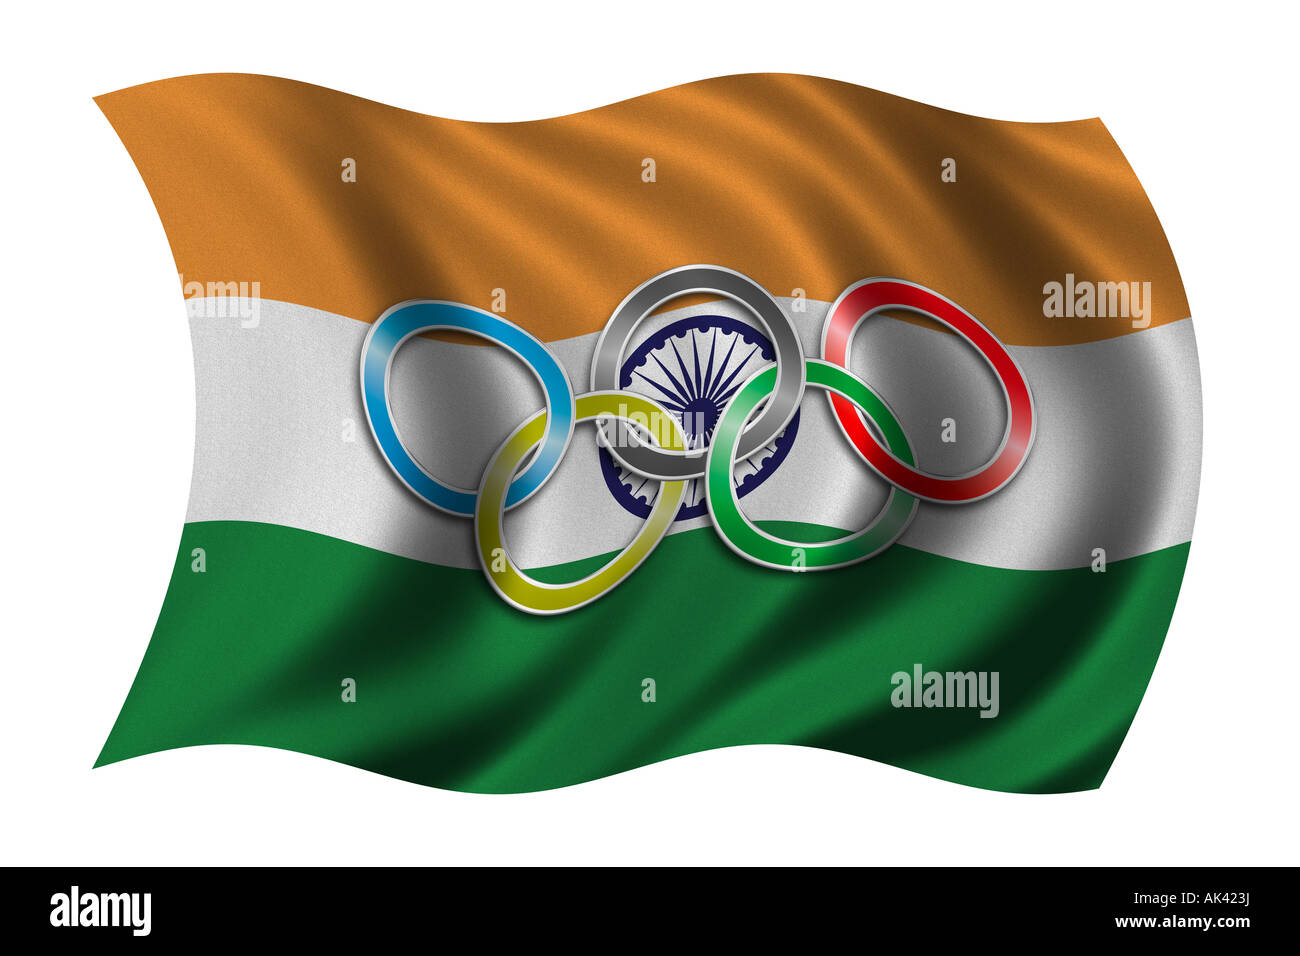 Flag of India with olympic symbol Stock Photo, Royalty Free Image ...